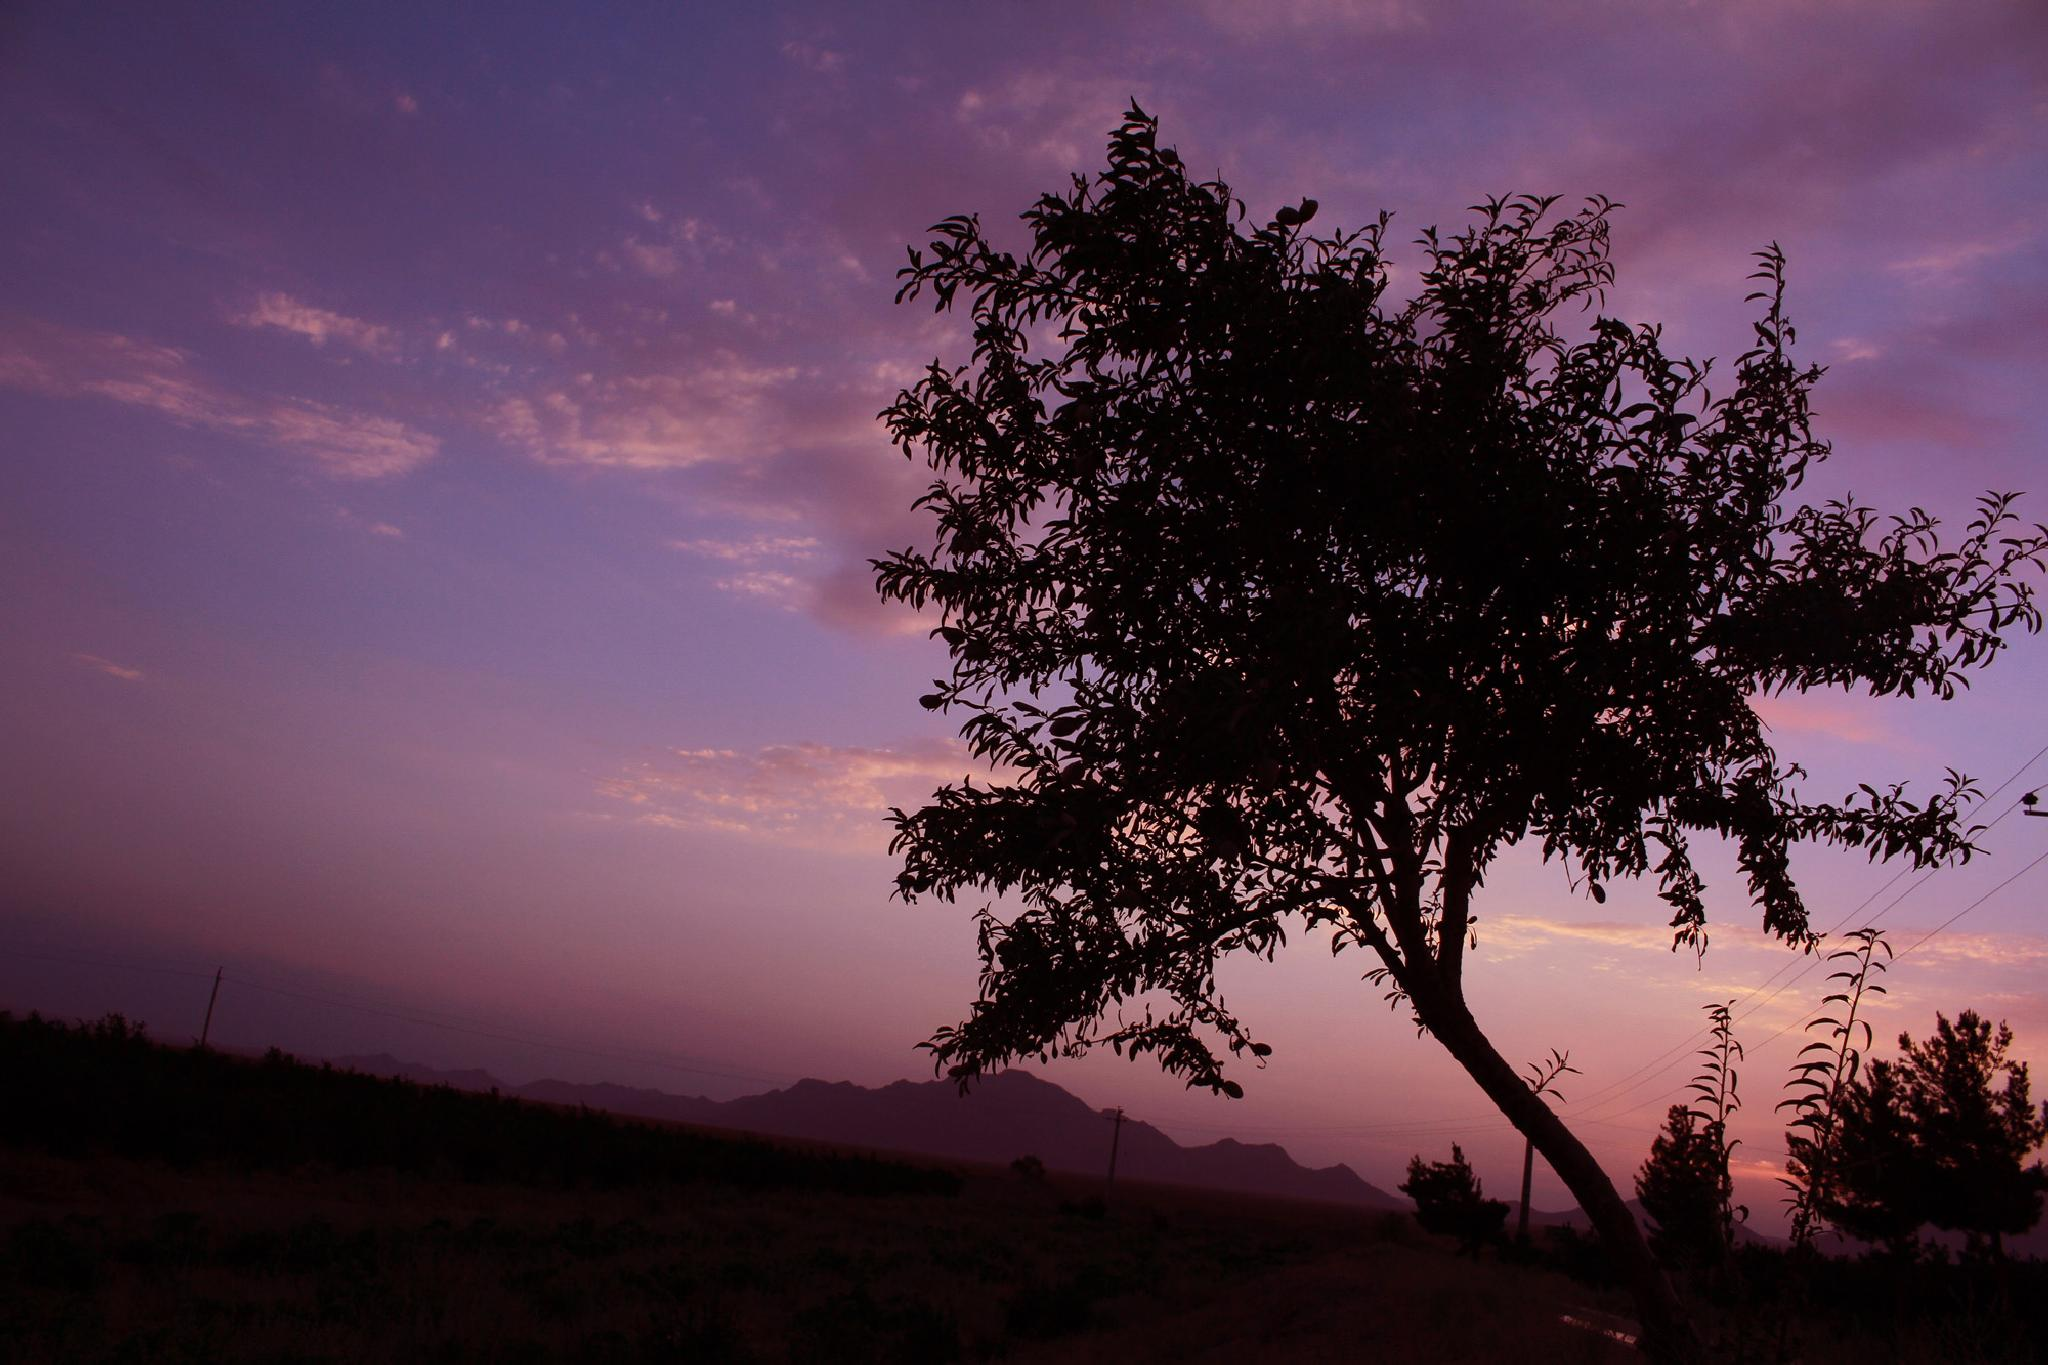 sunset 2 by hojjatnajafi6611